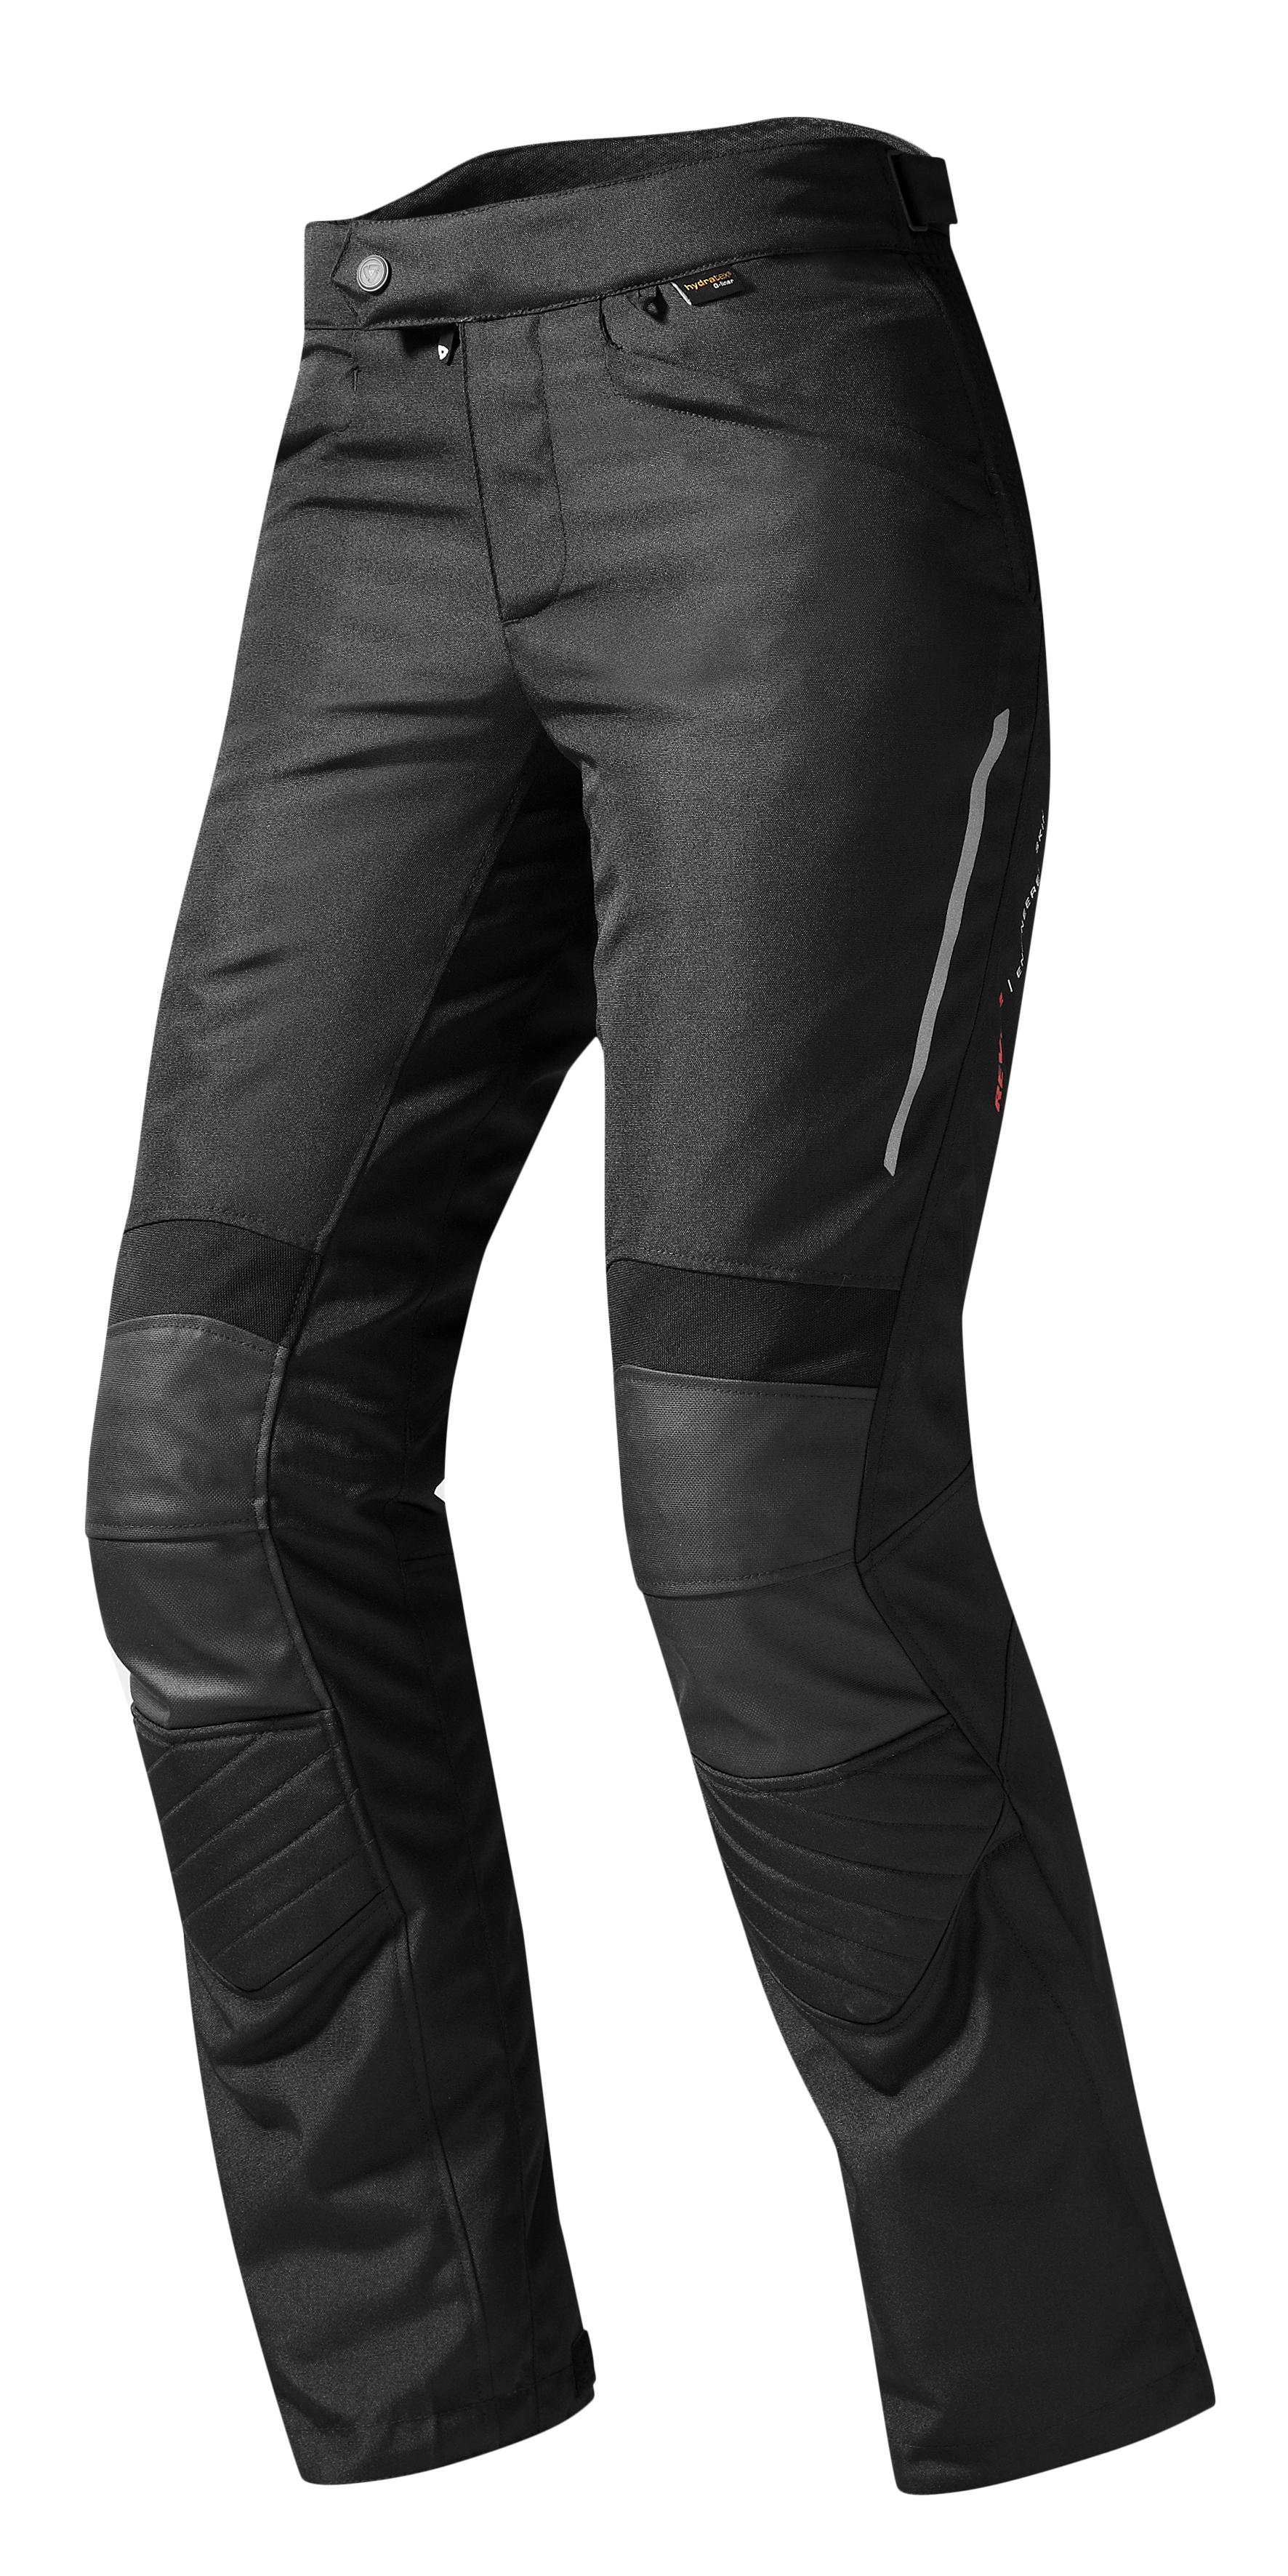 Pantalon Factor 3 Ladies | Afbeelding 1